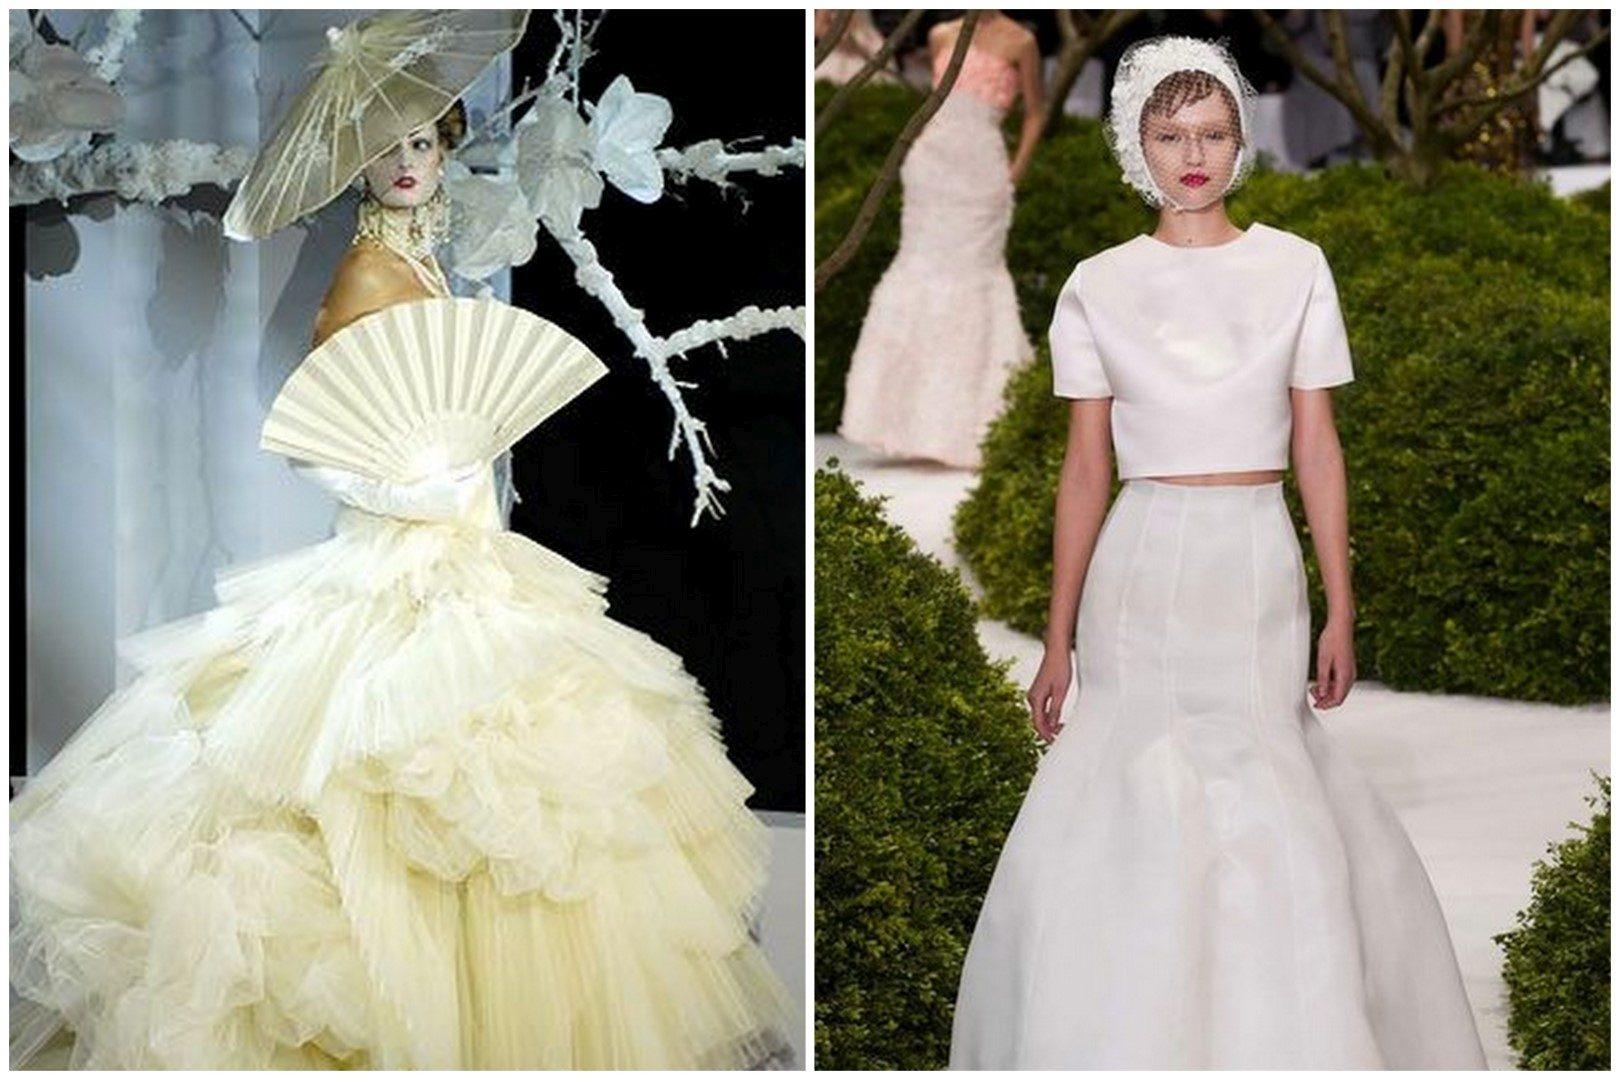 ,dior,galliano,raf simons,esküvői ruha,haute couture,haute couture esküvői ruha,esküvő,divattervező,